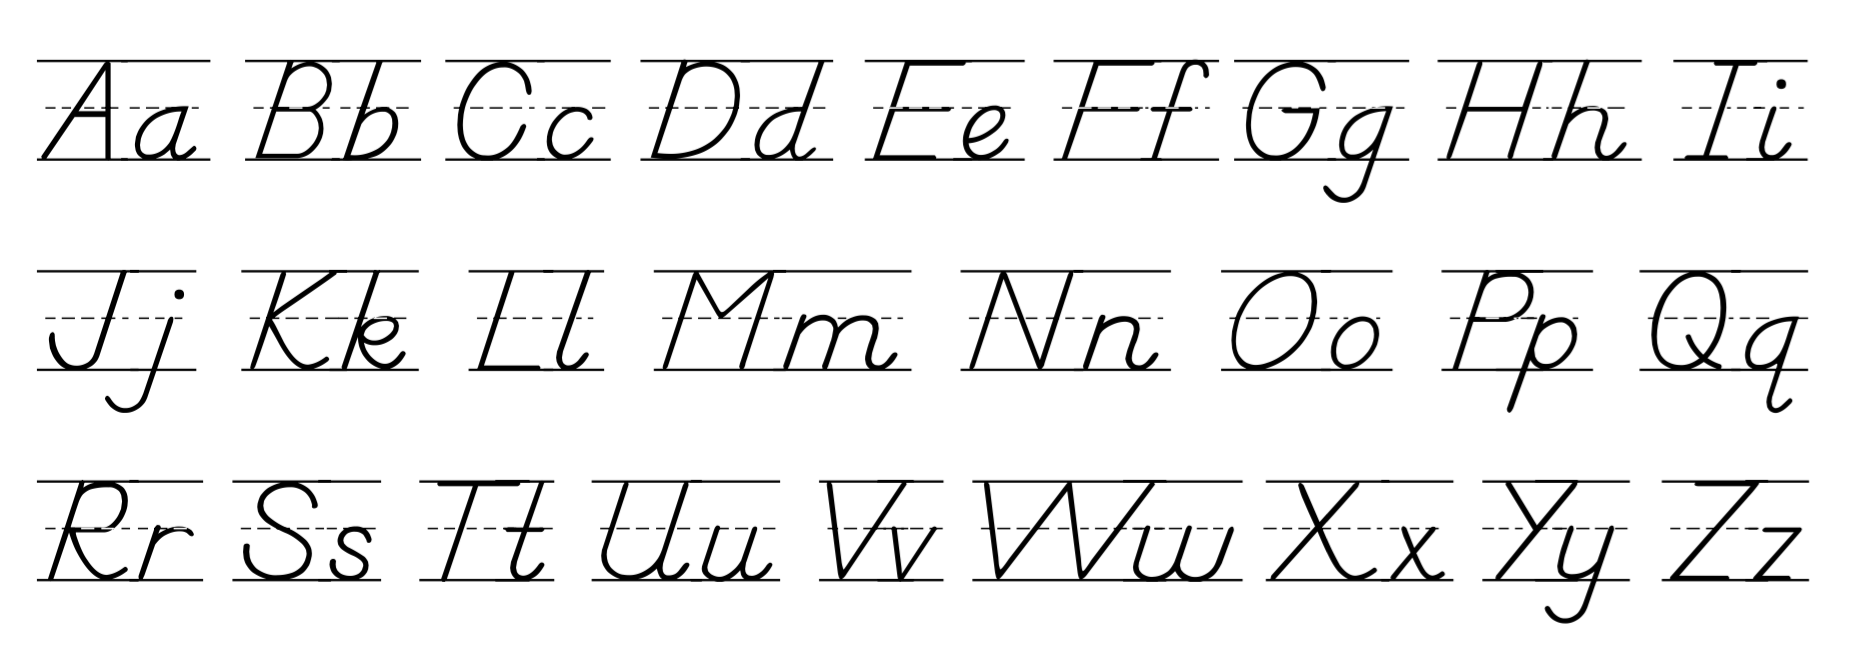 worksheet D Nealian Handwriting Worksheet subtracting integers worksheet fioradesignstudio uncategorized d nealian handwriting worksheet